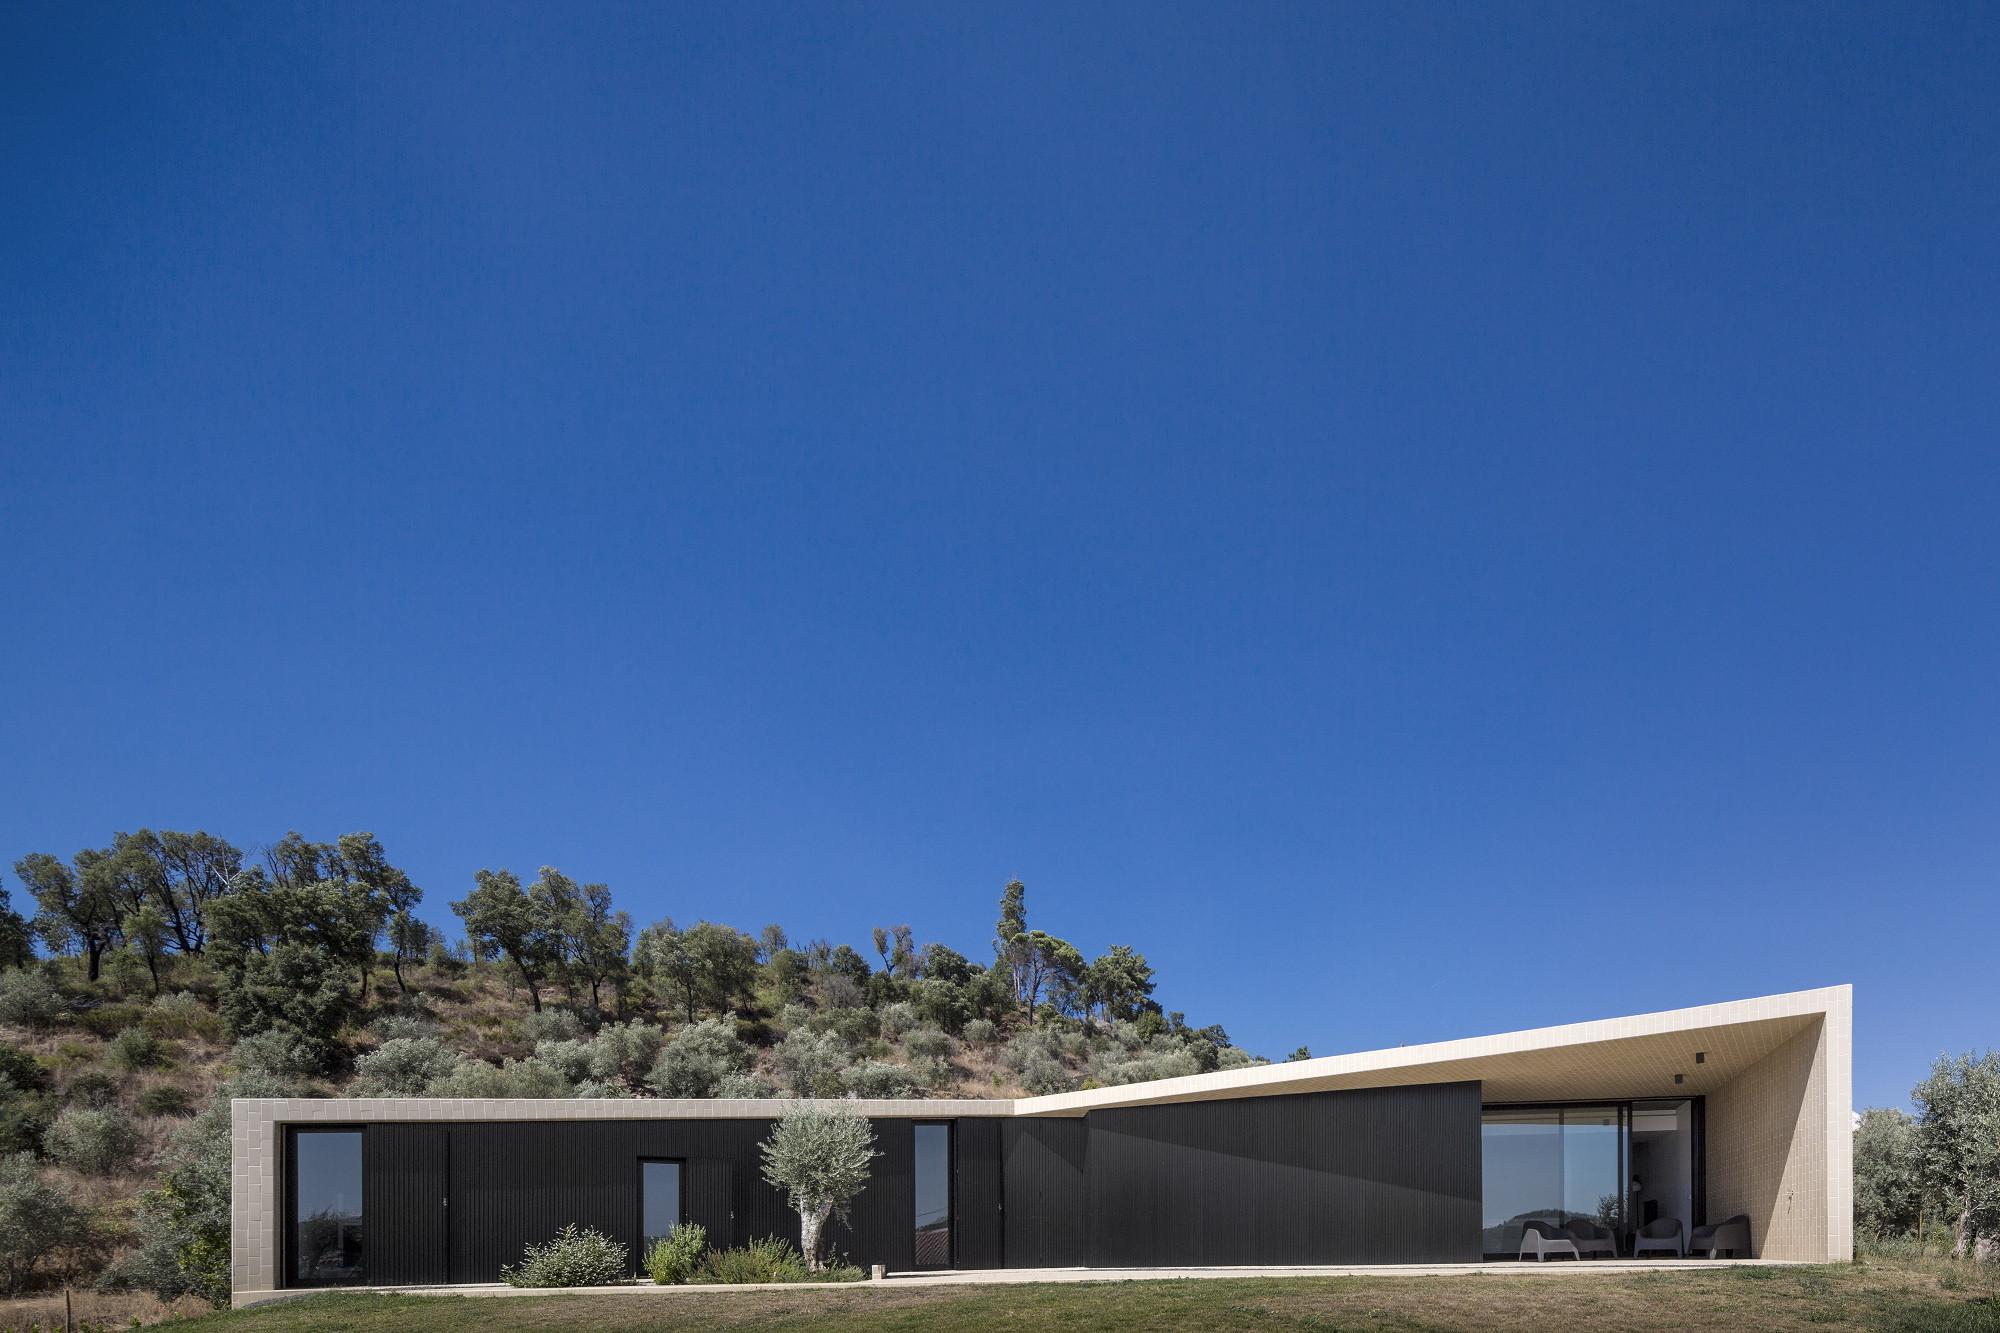 Tomar Hill House / Contaminar Arquitectos, © Fernando Guerra | FG+SG